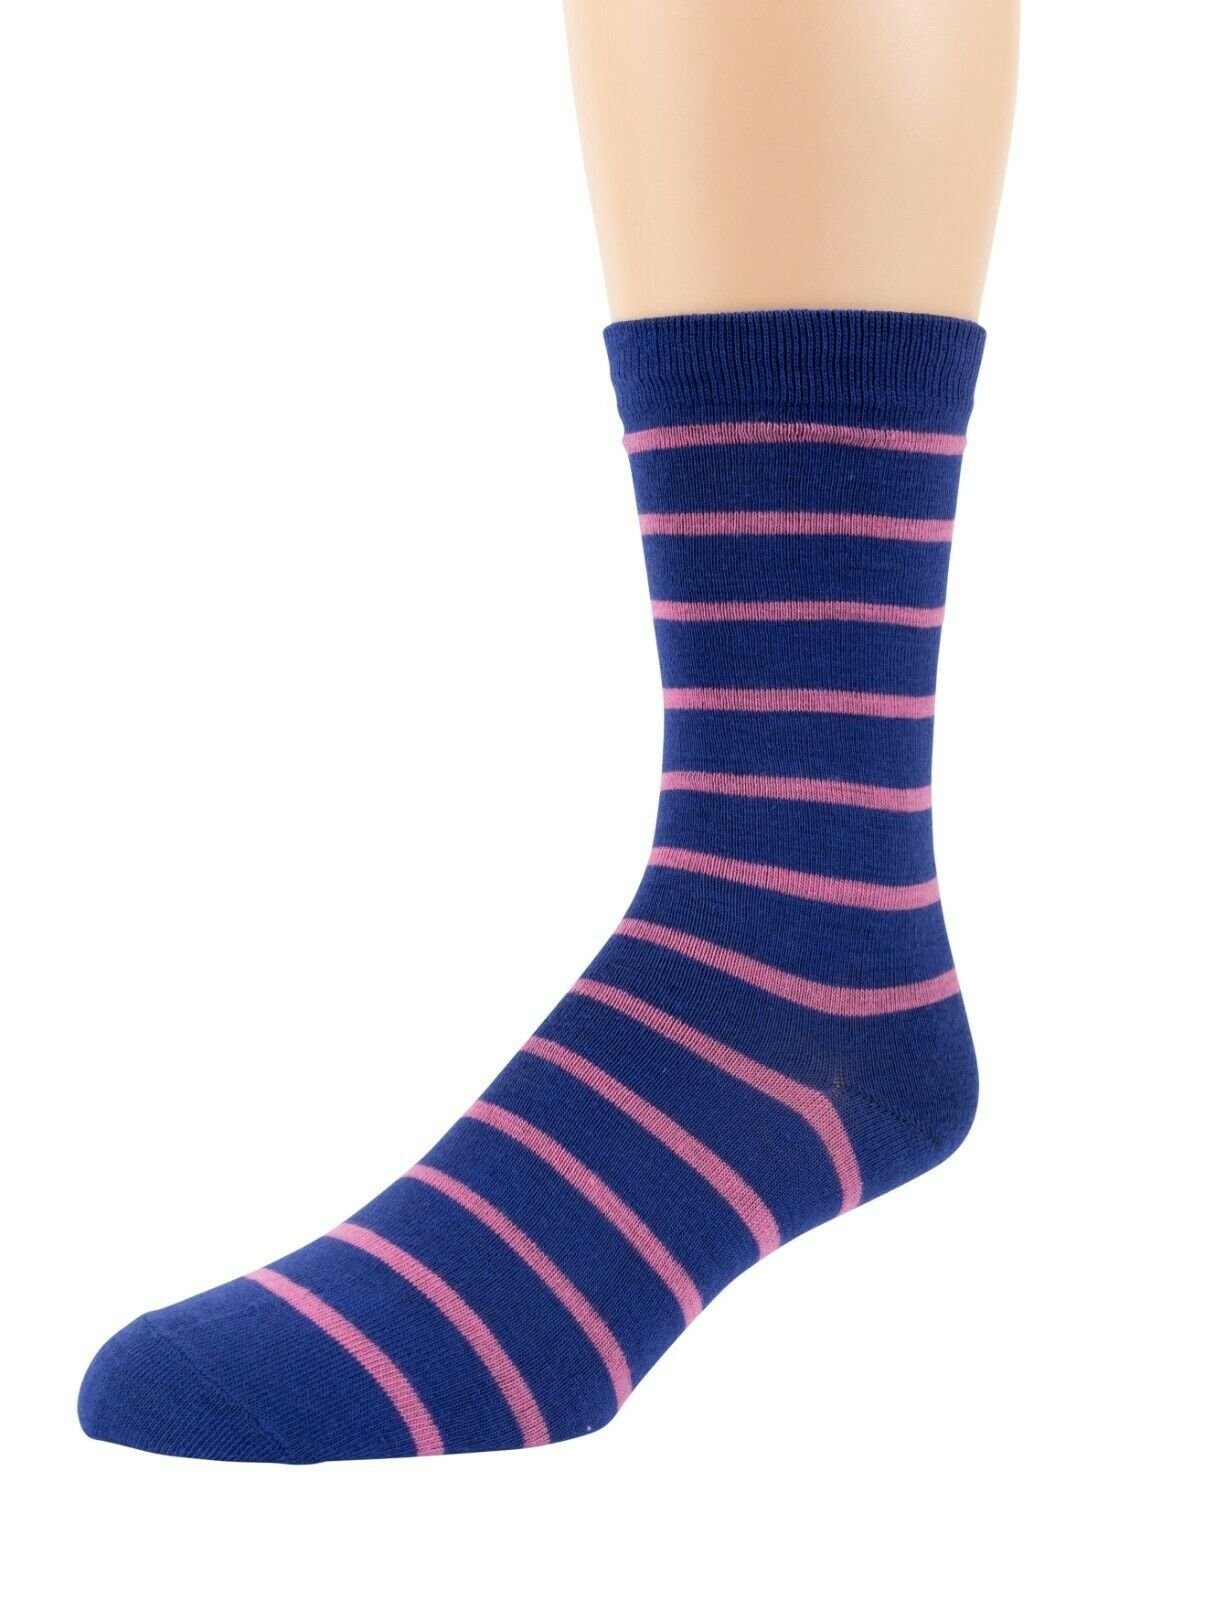 Mitch-Bogen-Mens-Cotton-Dress-Socks-Colorful-Fashion-Crew-Socks-8-Pack-Gift-Box thumbnail 65